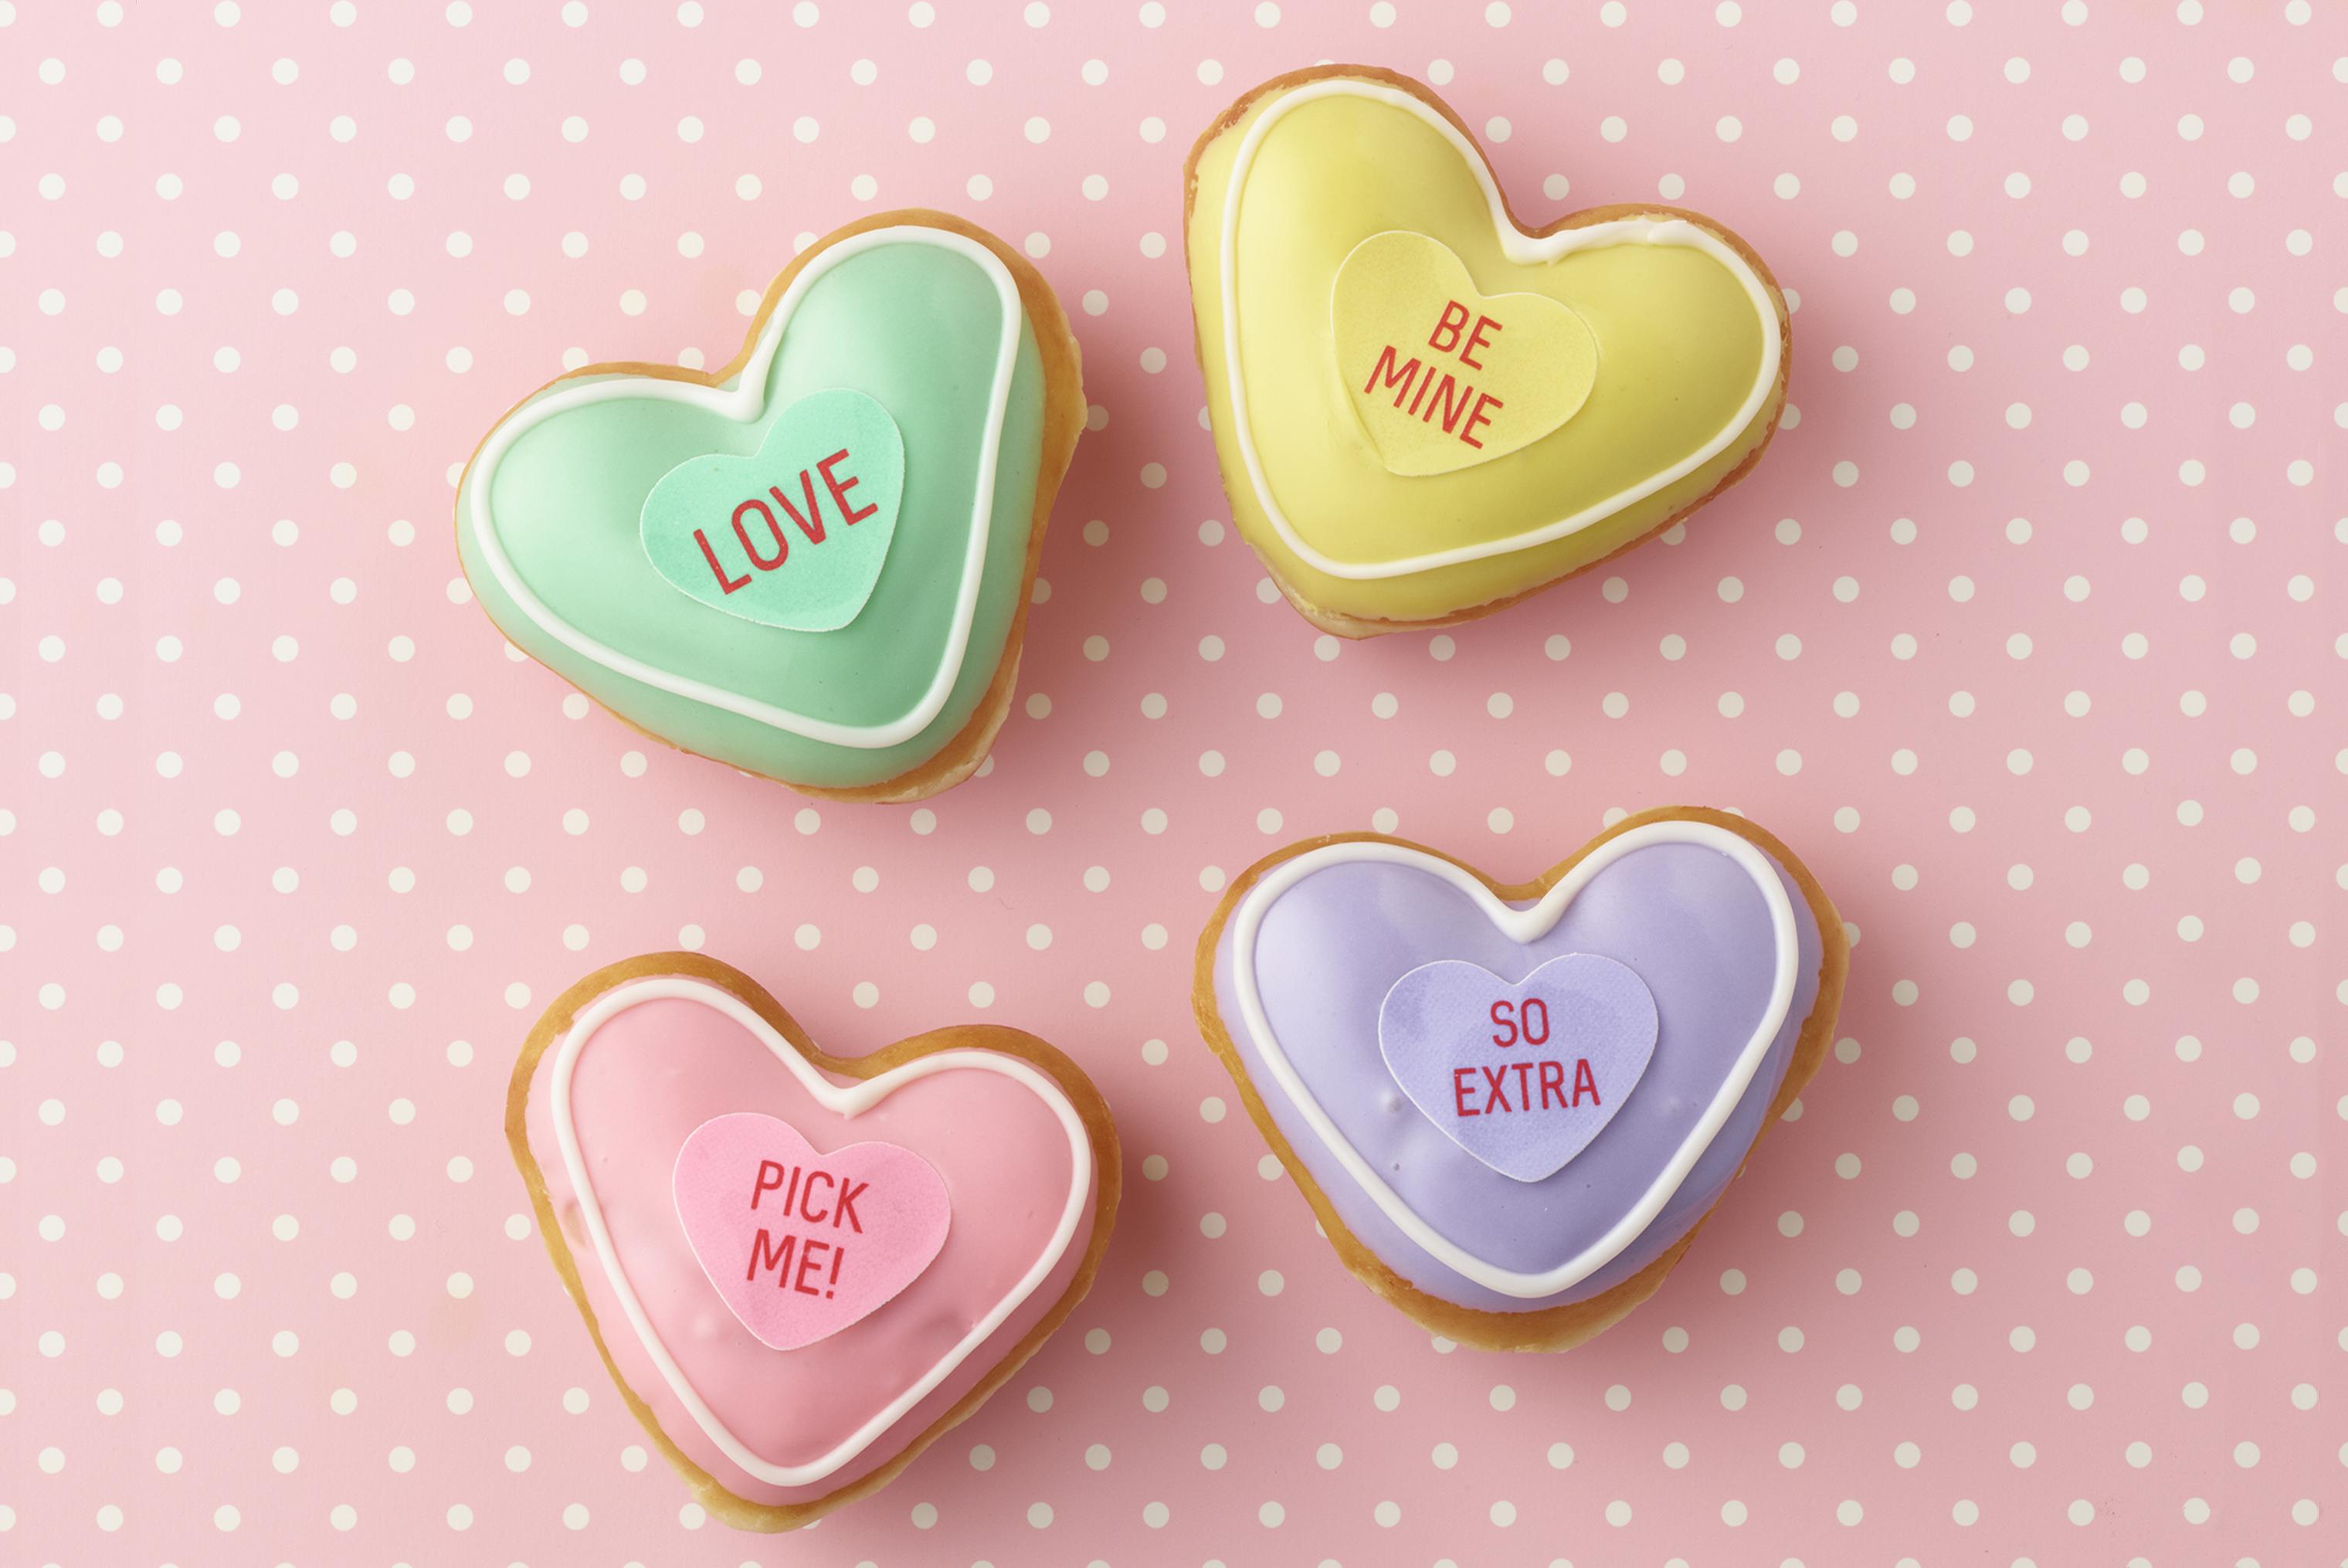 krispy-kremes-valentine-conversation-doughnuts-